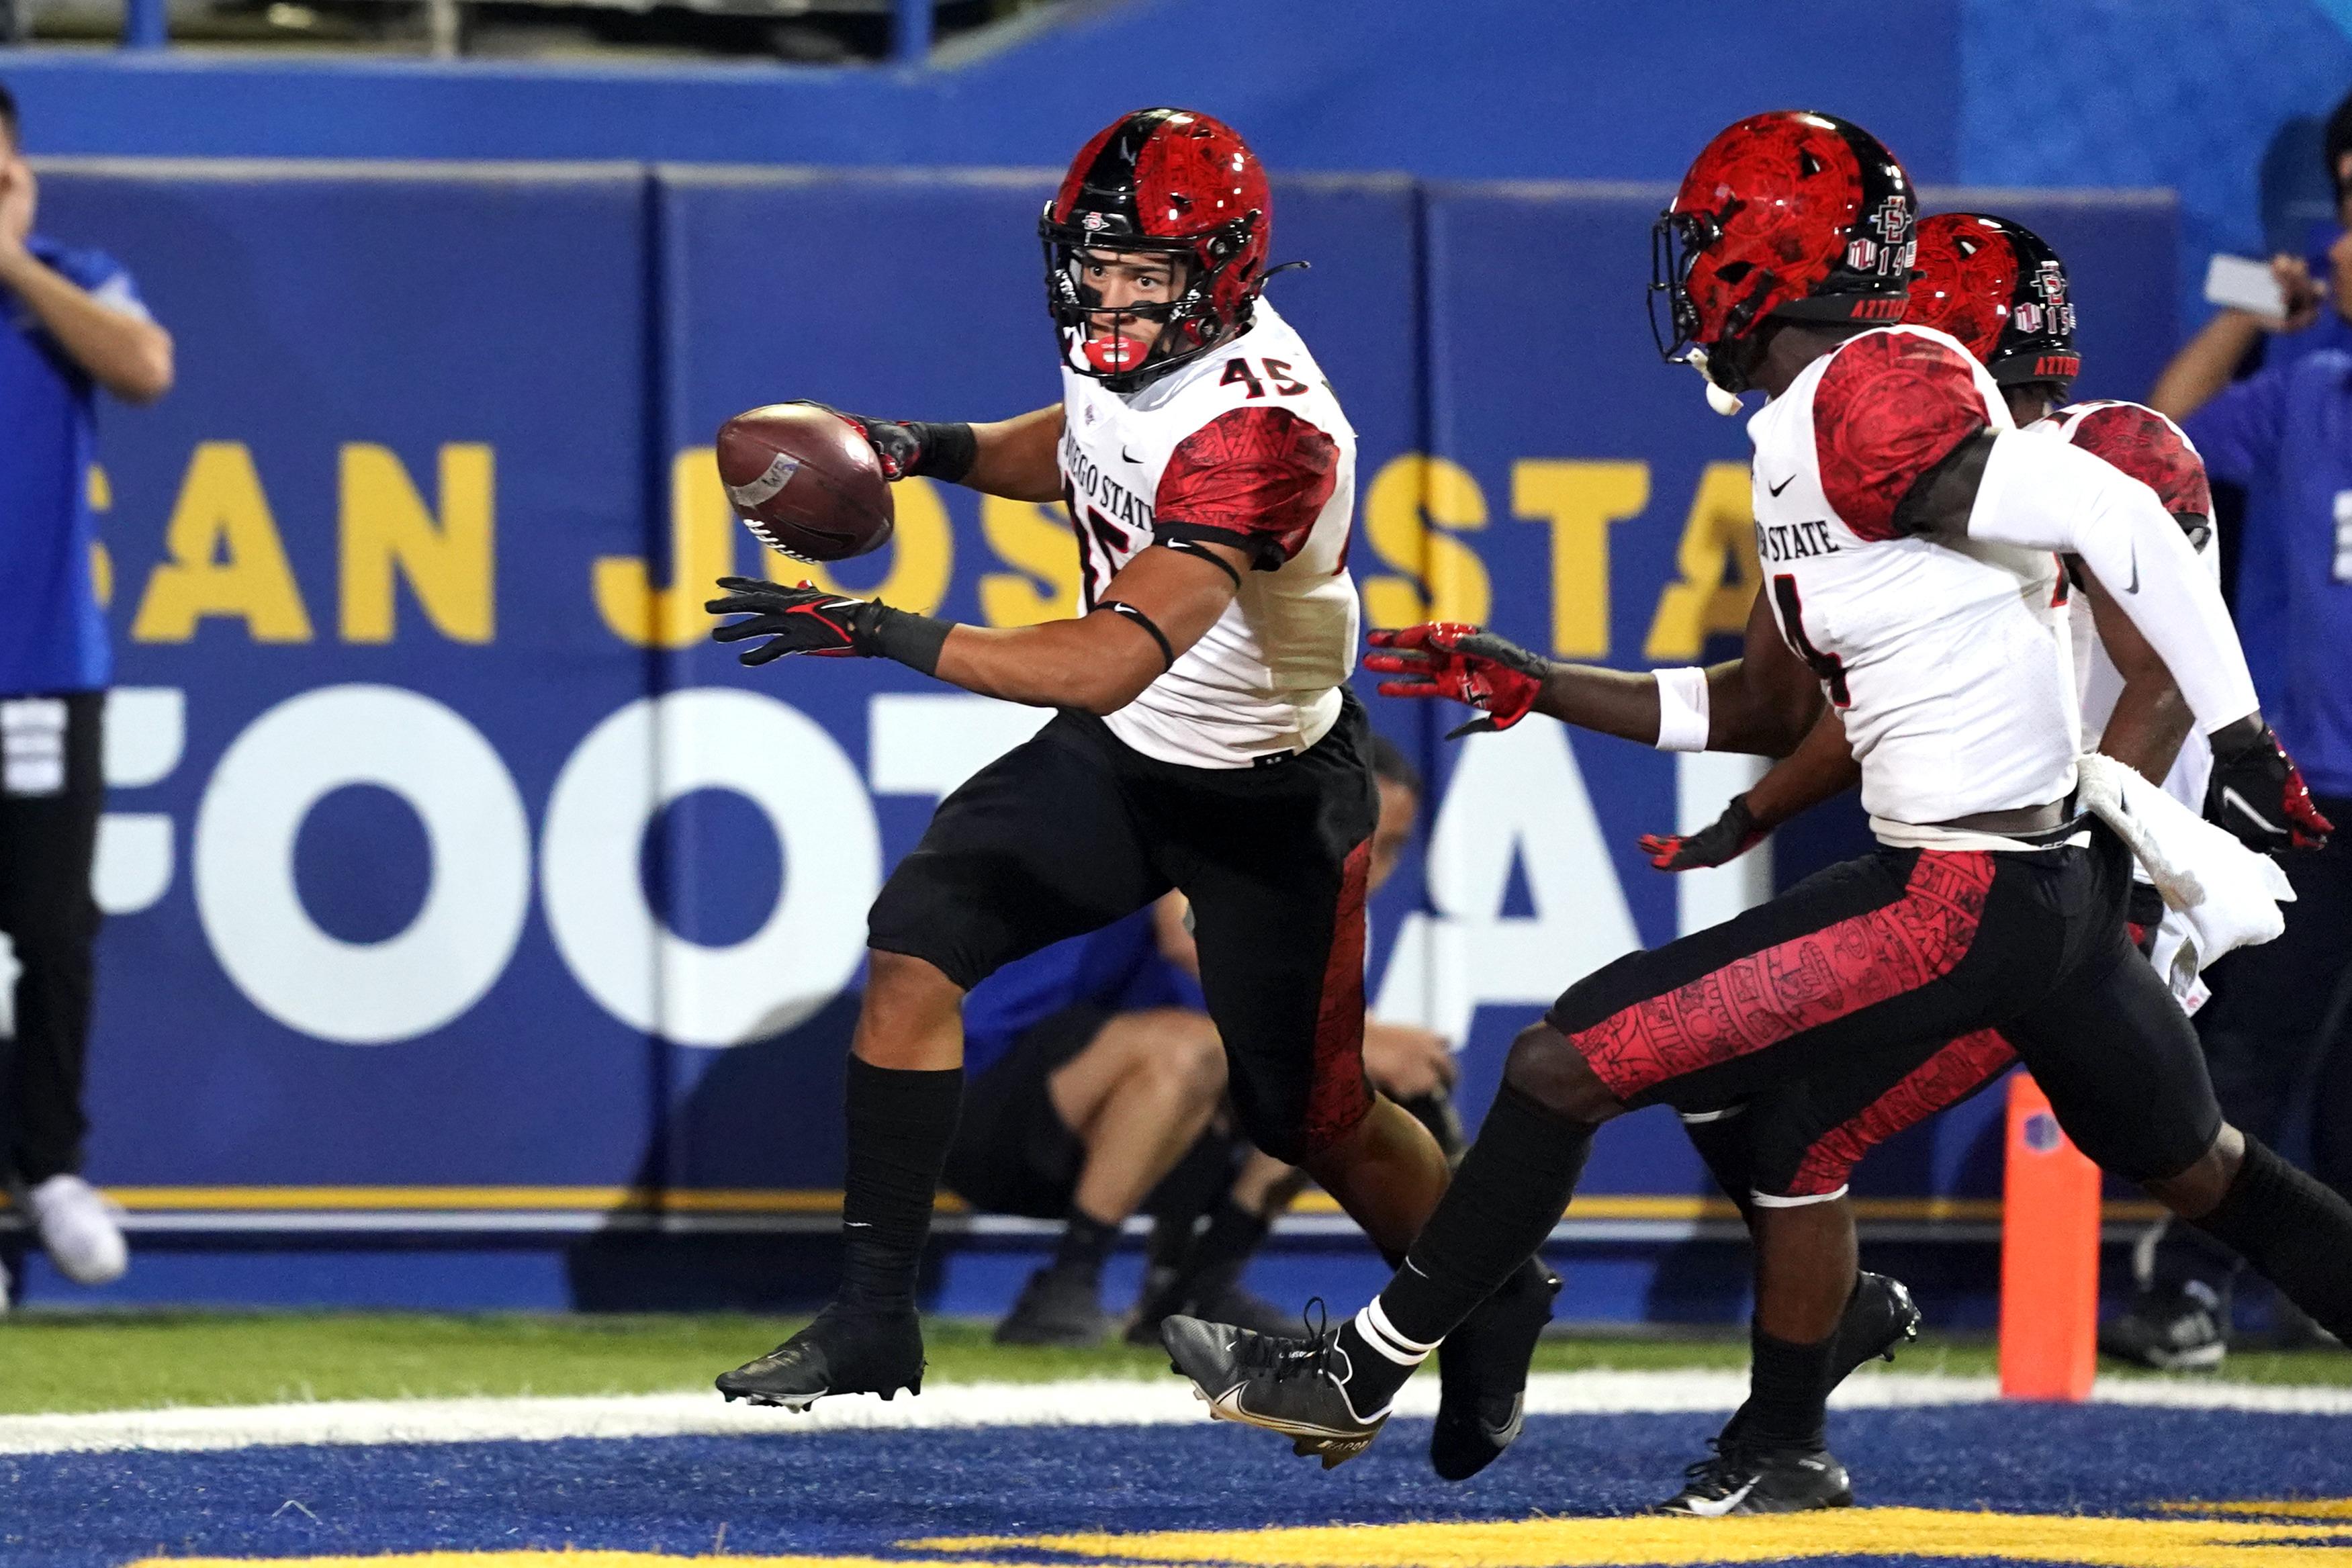 NCAA Football: San Diego State at San Jose State